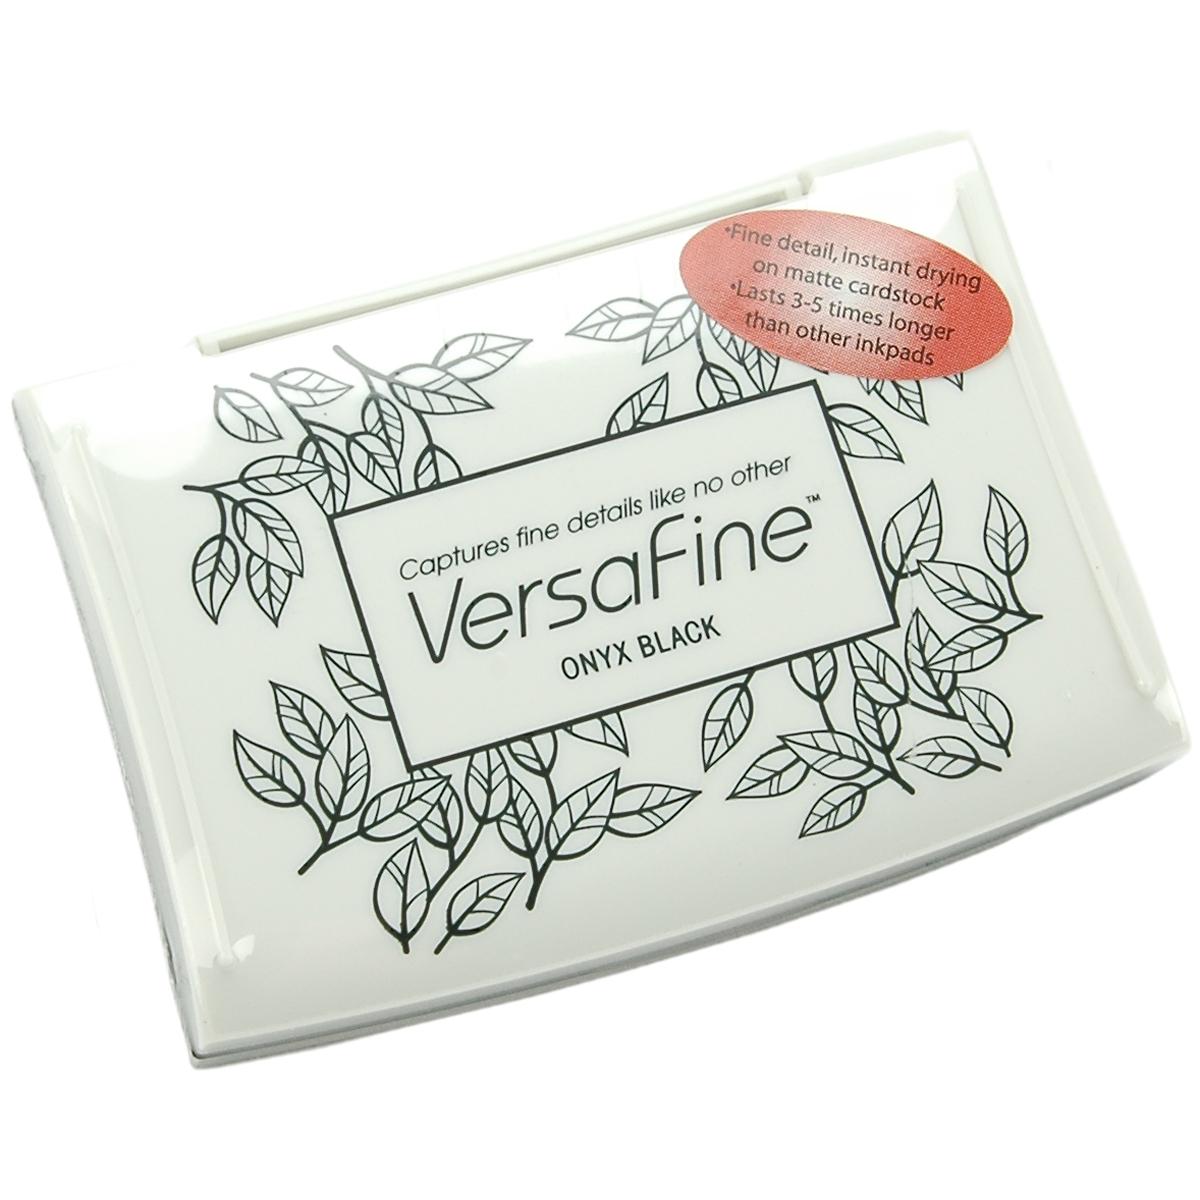 VersaFine Pigment Ink Pad-Onyx Black